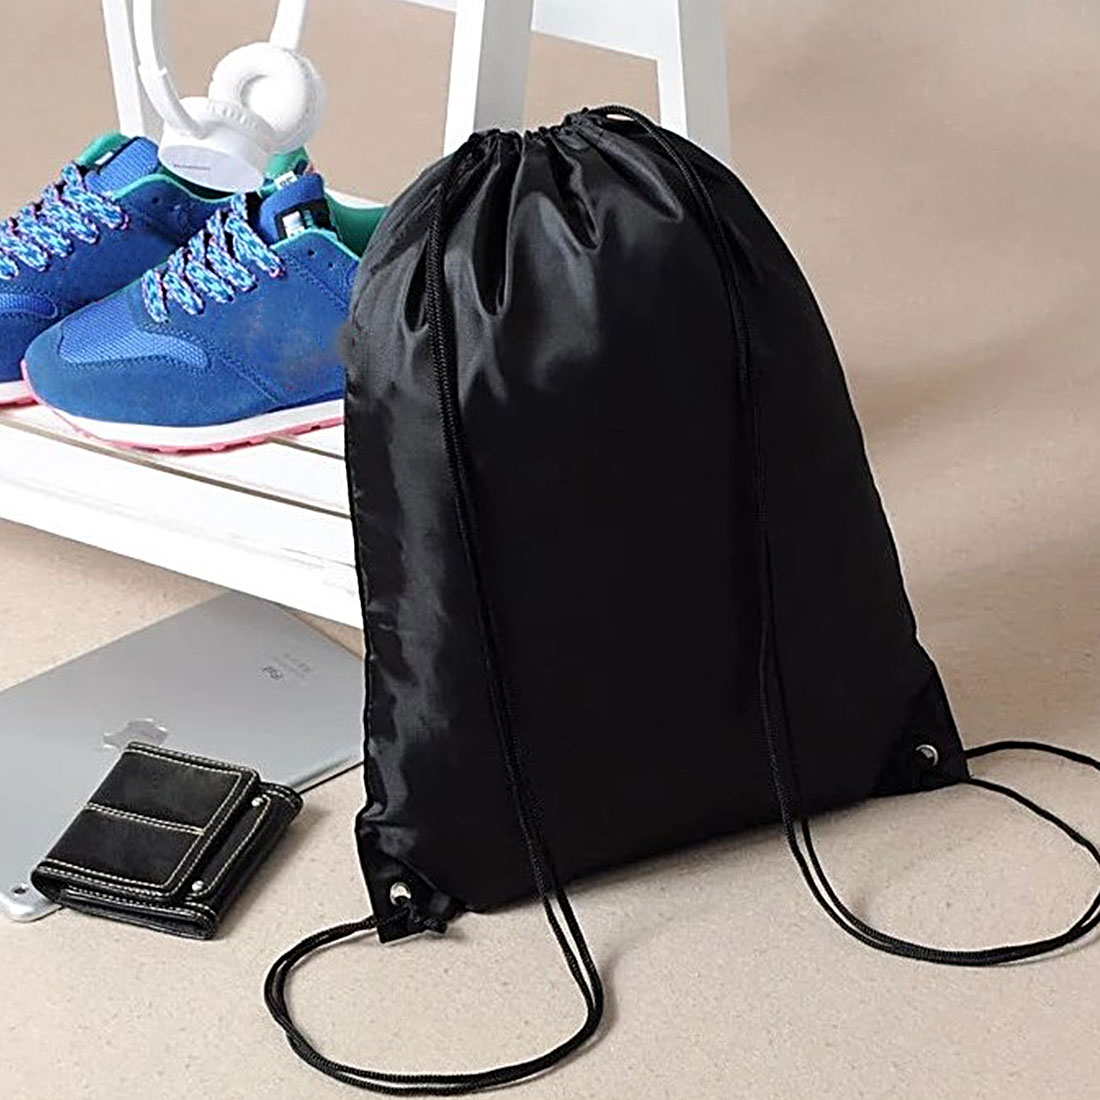 Hot Black Green Waterproof Swimming Backpack Double Layer Drawstring Sport Bag Shoulder Bag Water Sports Travel Portable Bag